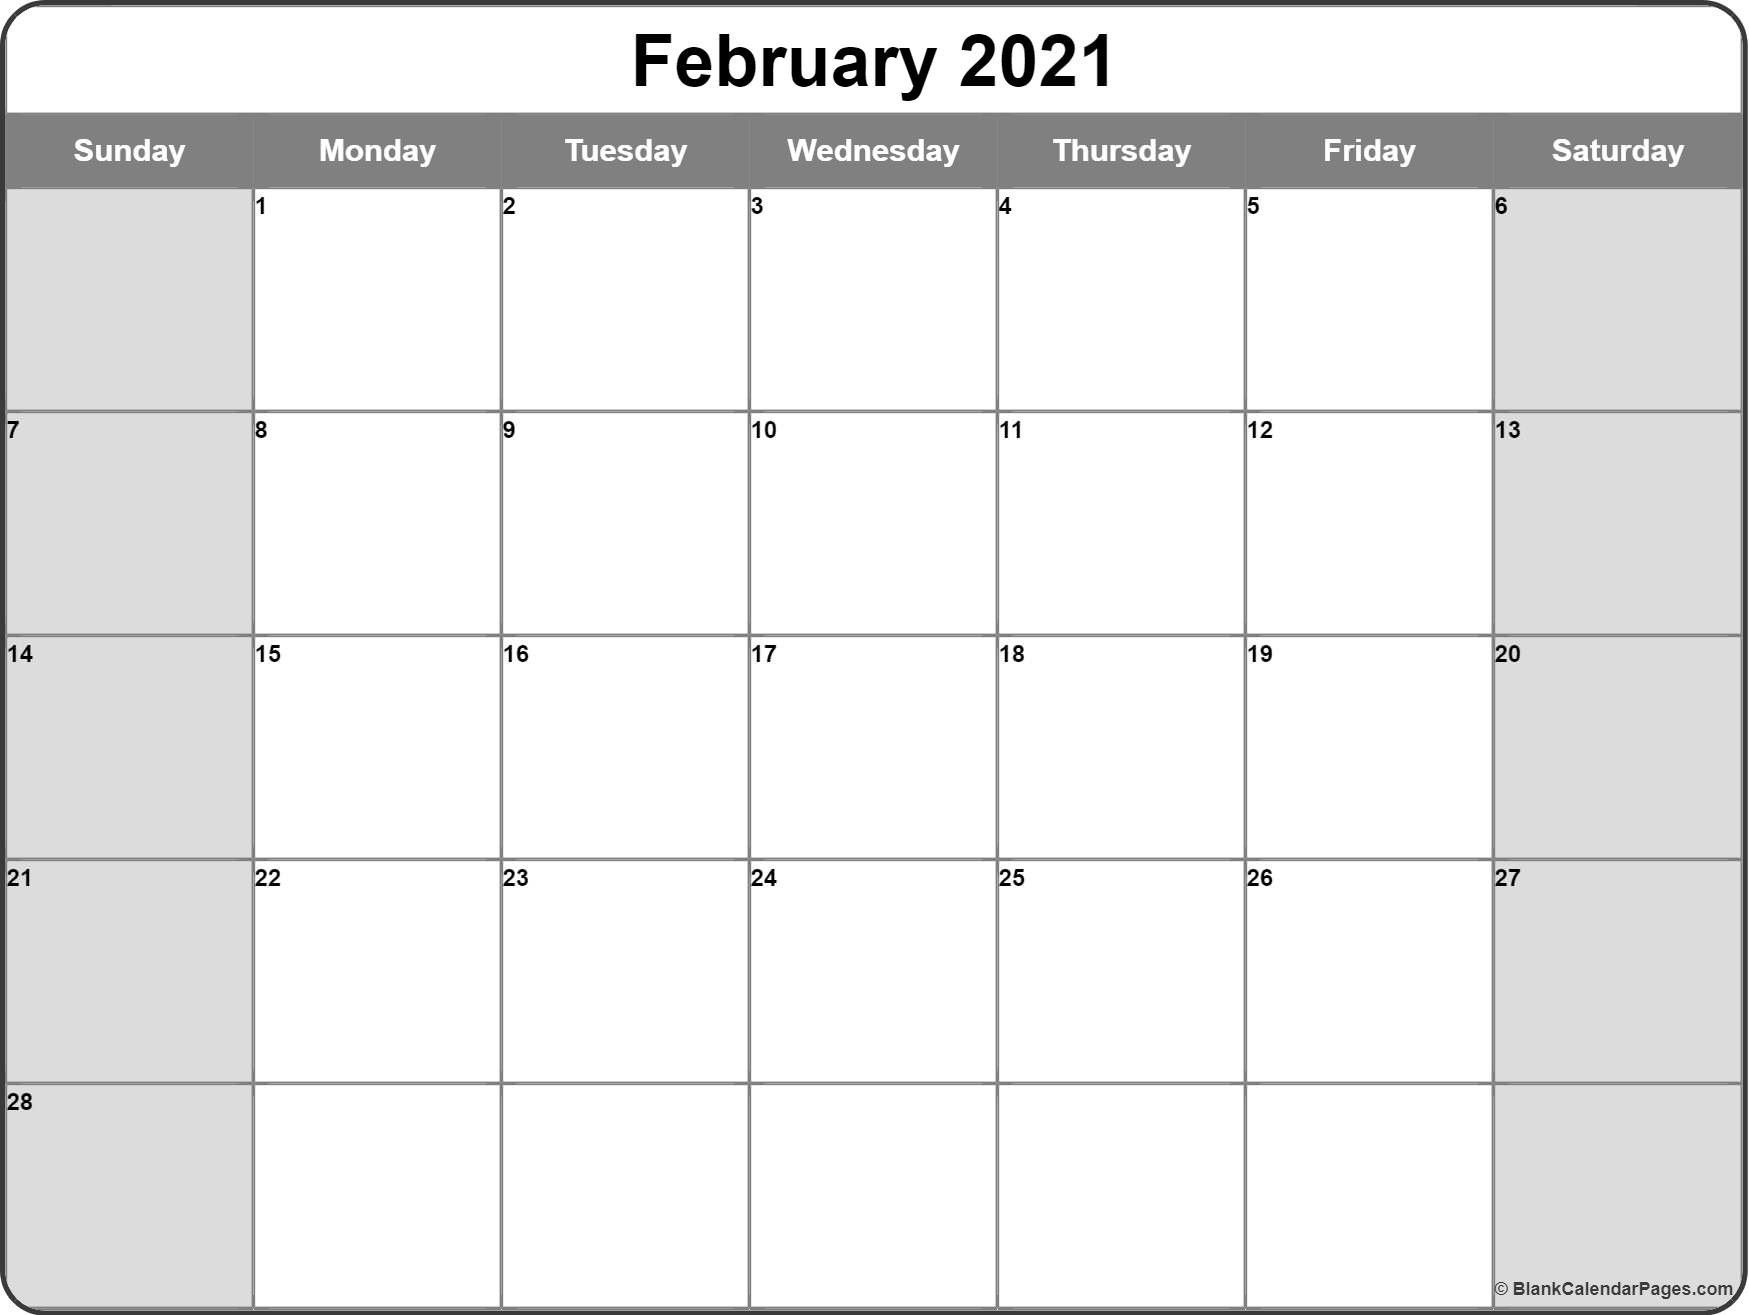 Blank February 2021 Calendar Page | Monthly Calendar